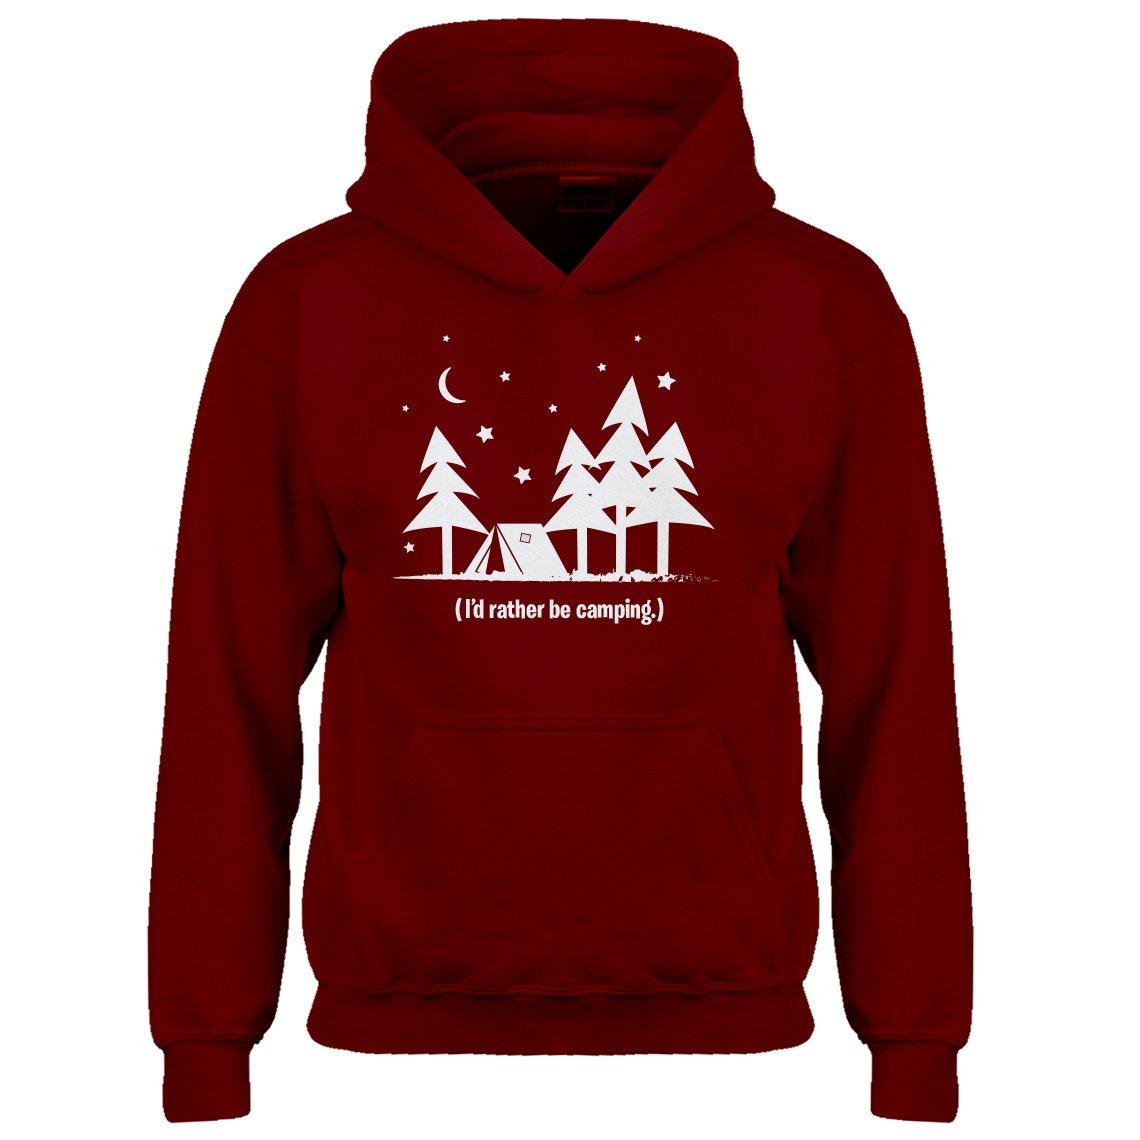 Indica Plateau Kids Hoodie I'd Rather be Camping Medium Red Hoodie